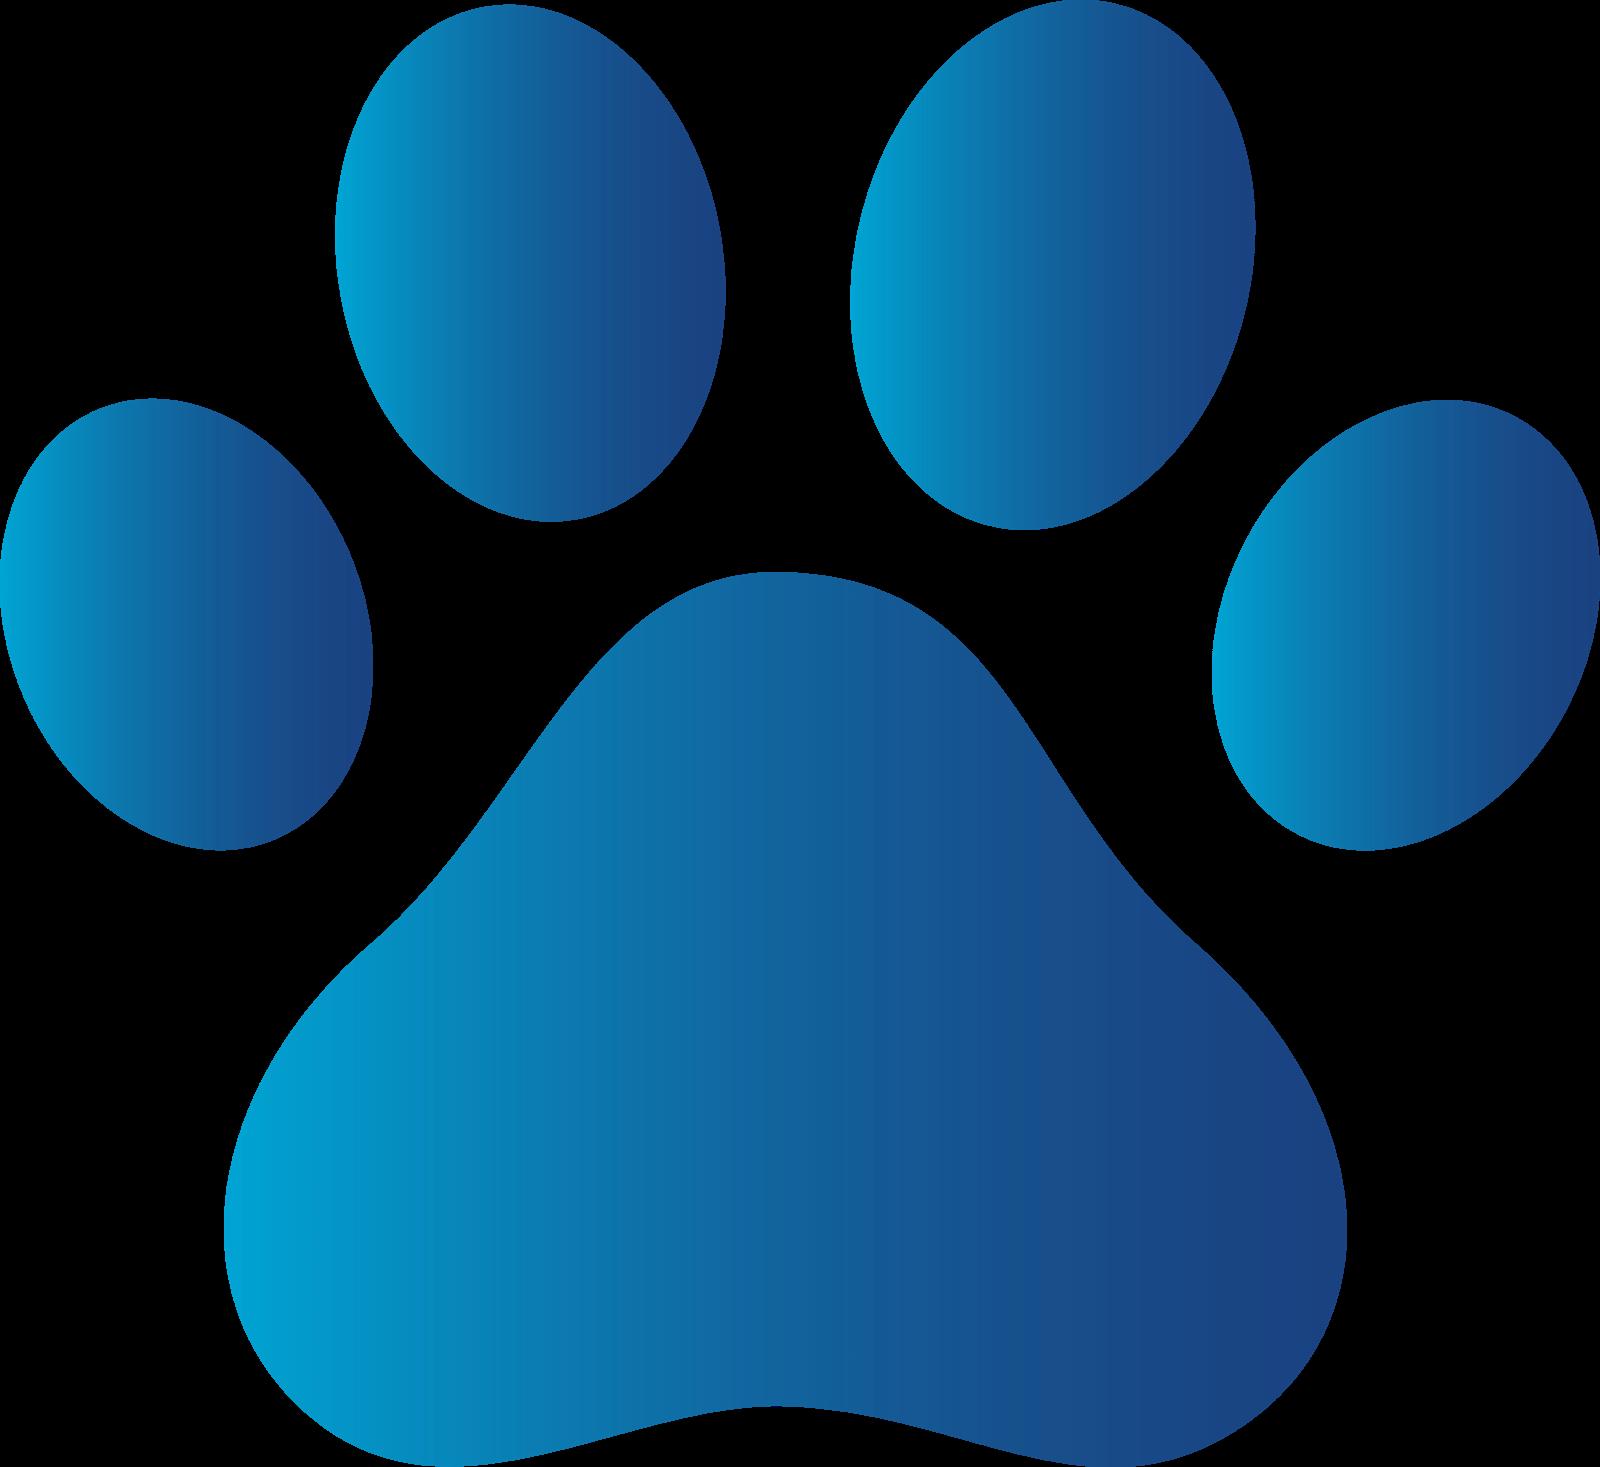 Dog paw patrol logo clipart free jpg royalty free library dog paw print template back gt gallery for gt white bear claw ... jpg royalty free library